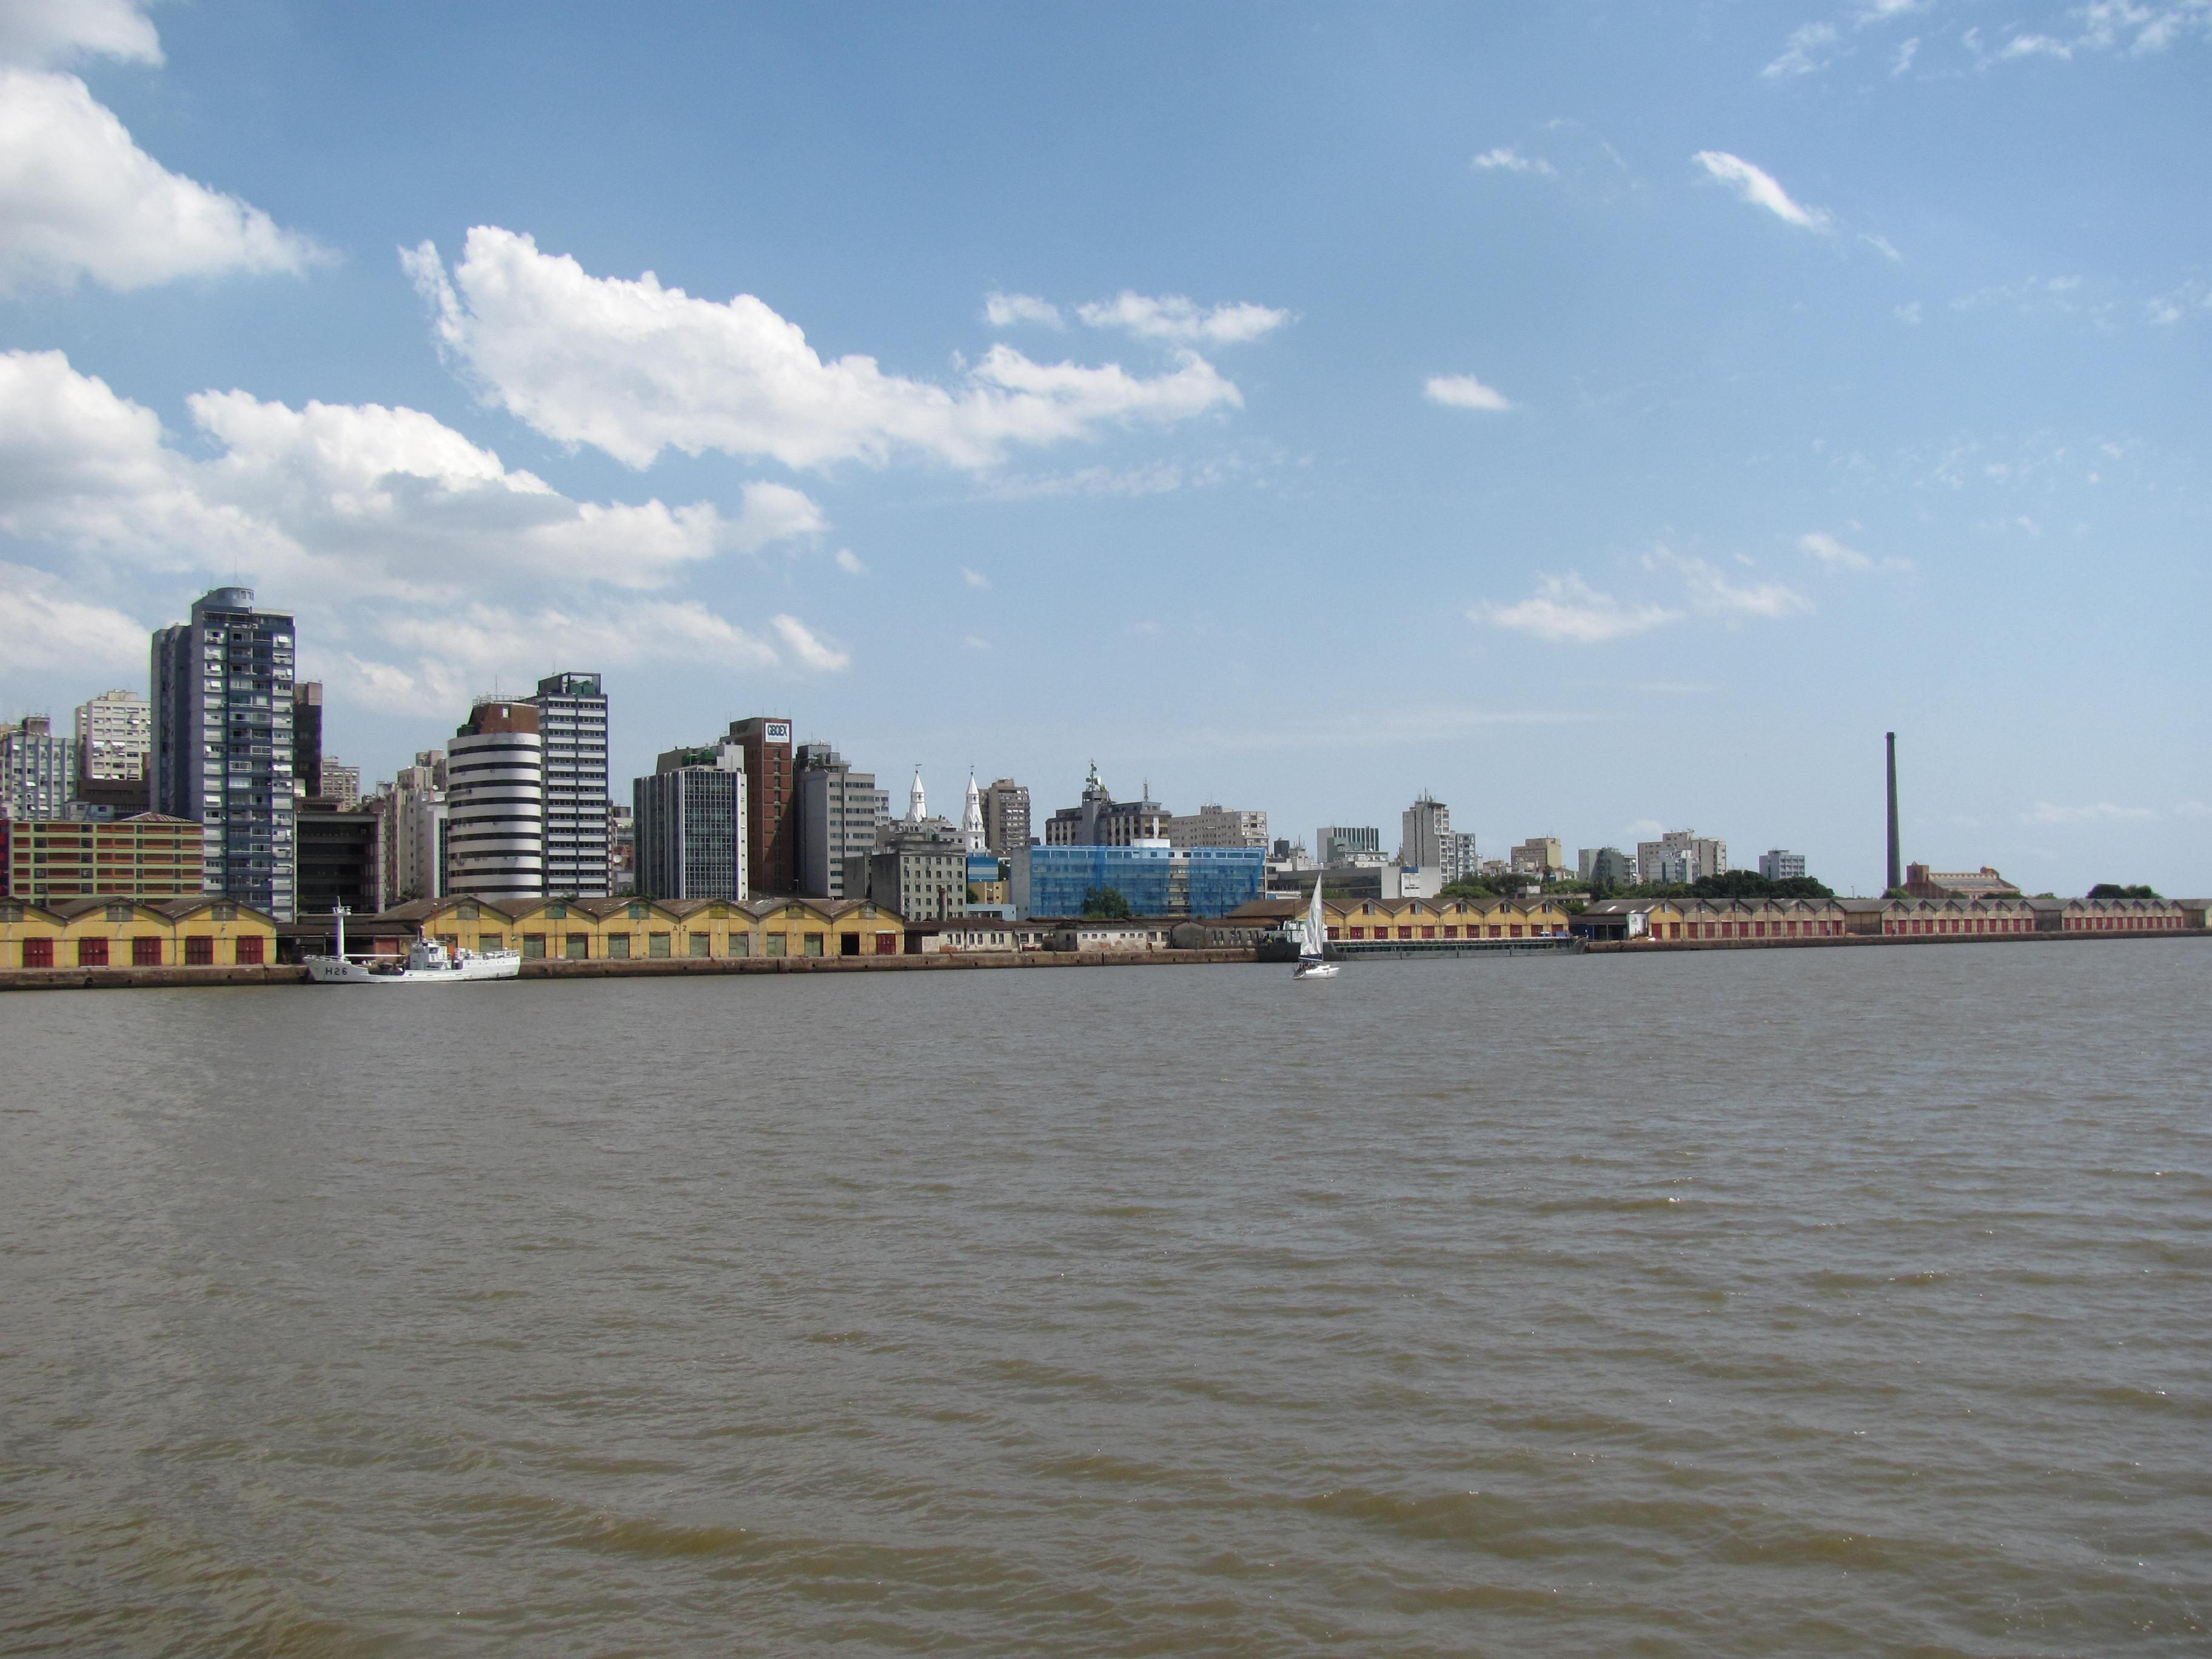 Vista De Porto Alegre A Partir Do Rio Guaíba 03